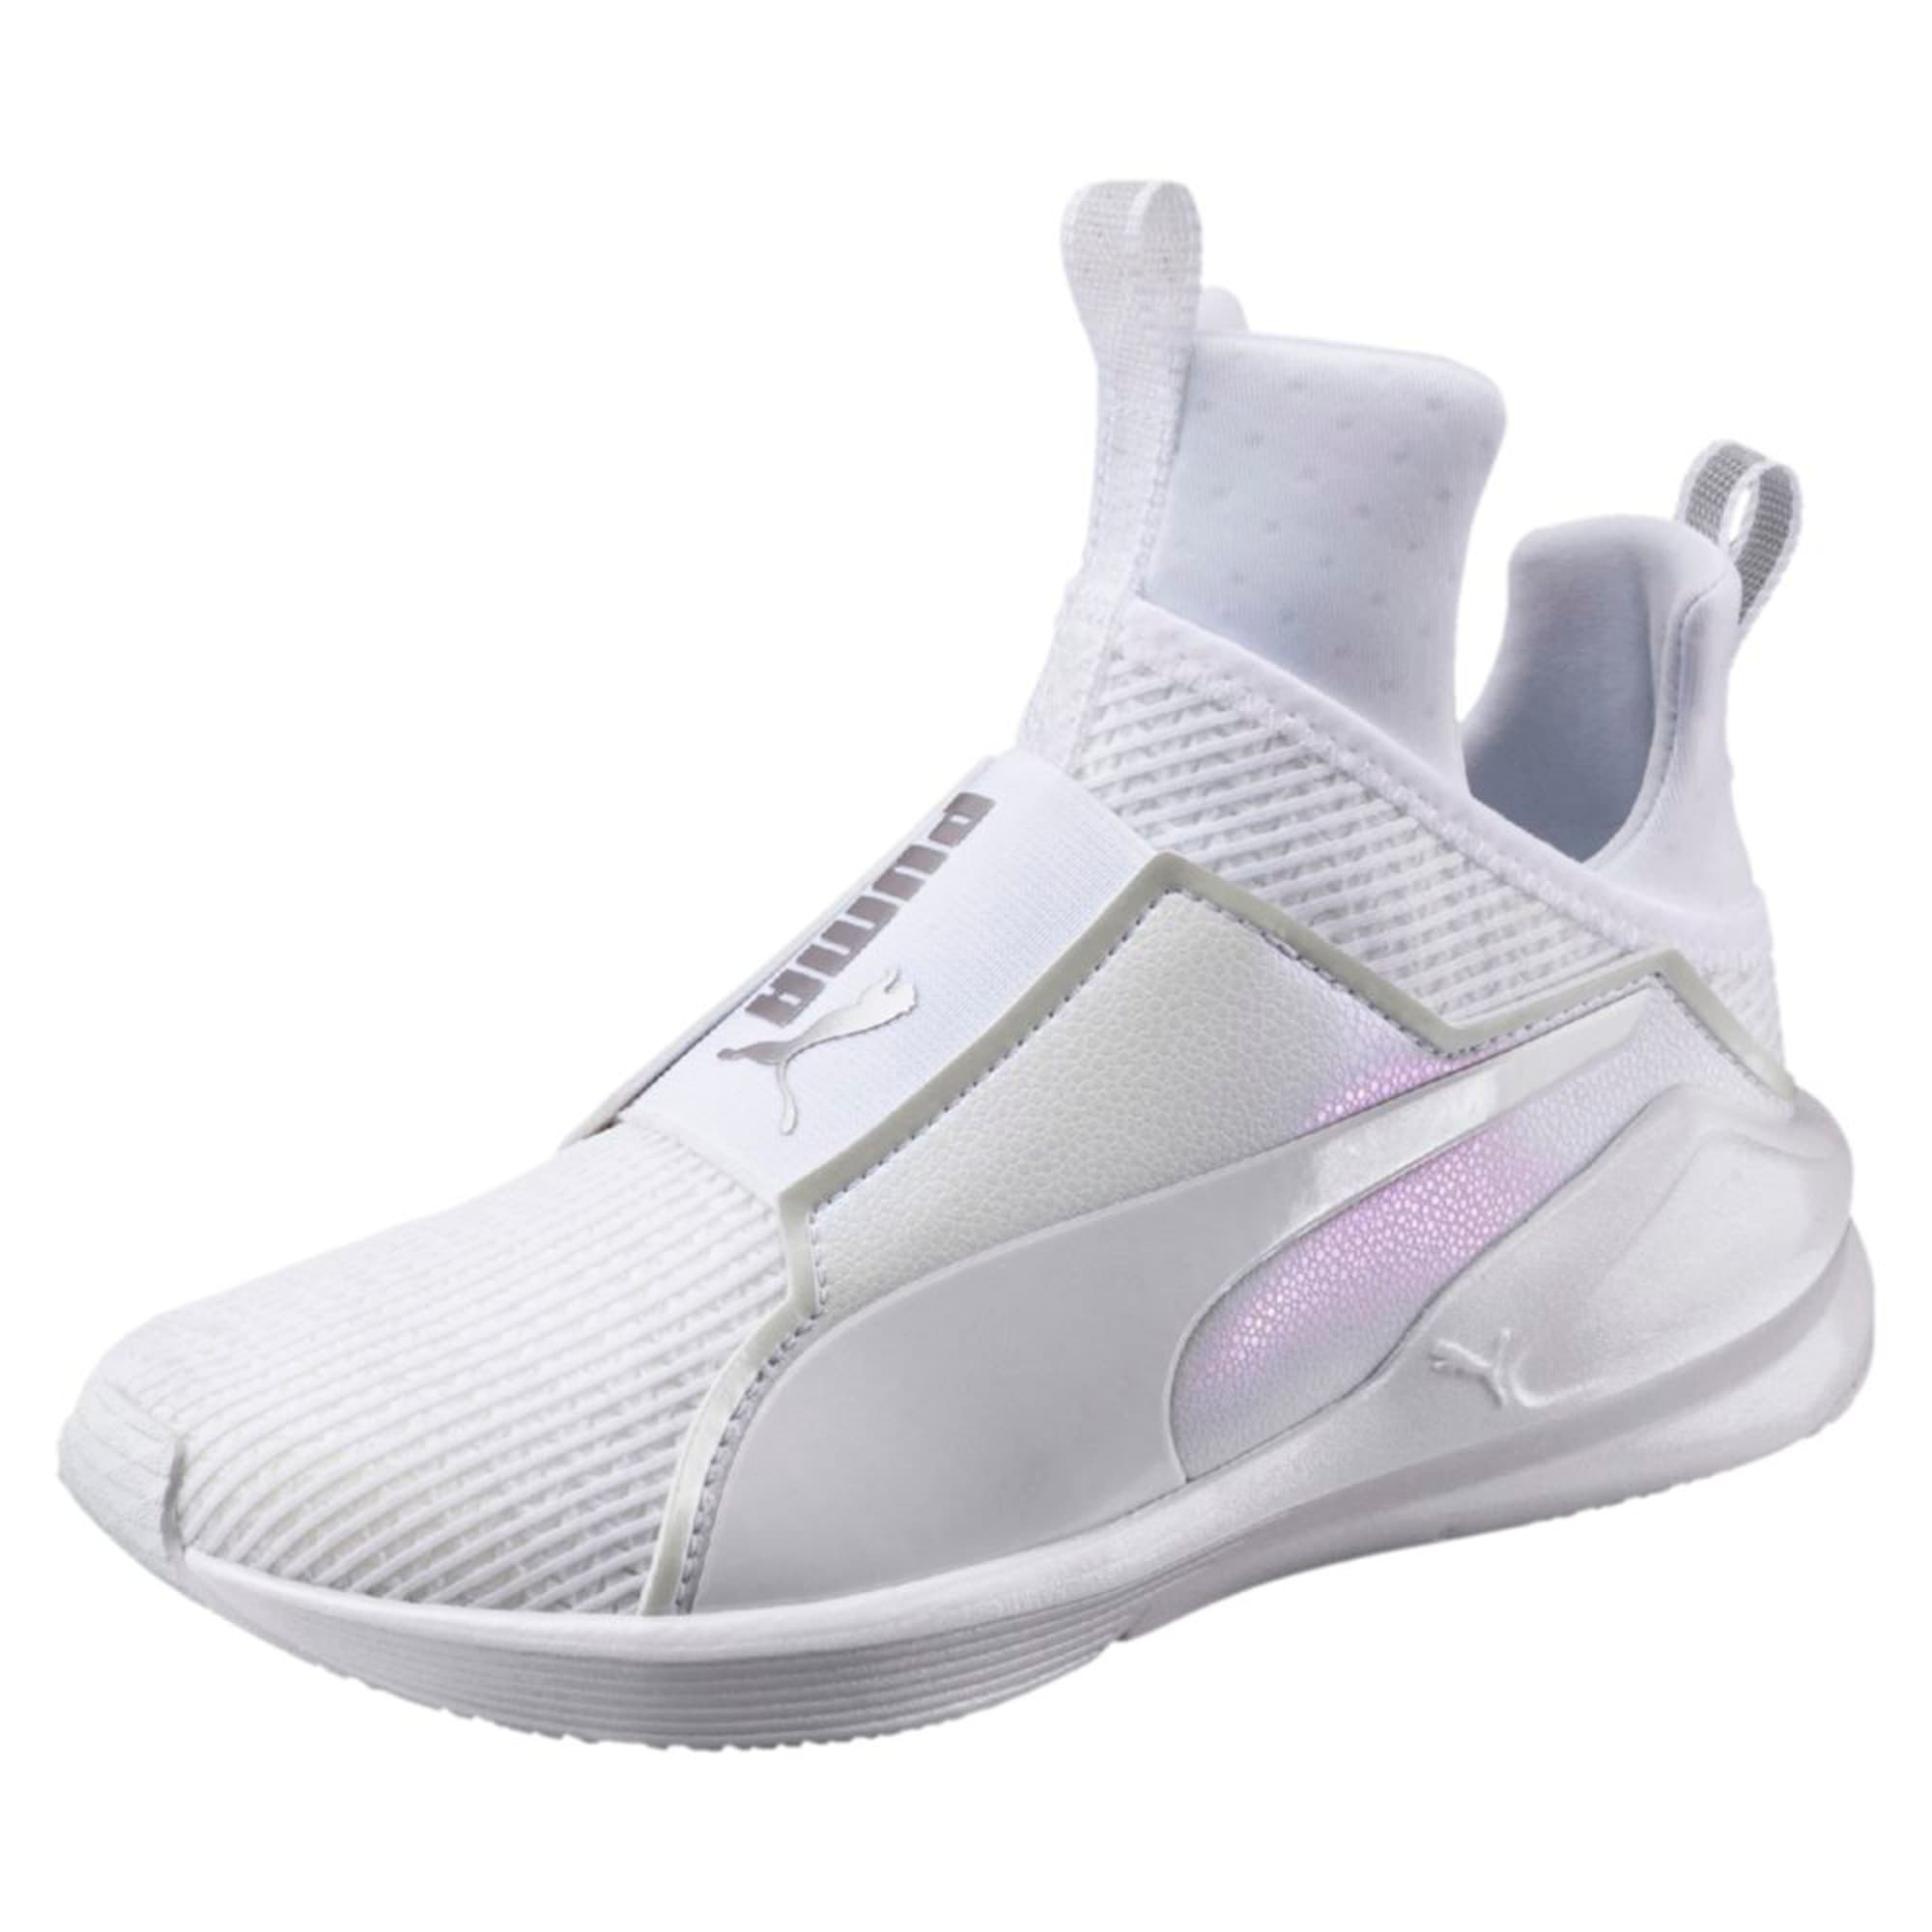 Thumbnail 1 of Fierce En Pointe Women's Training Shoes, Puma White-Puma White, medium-IND